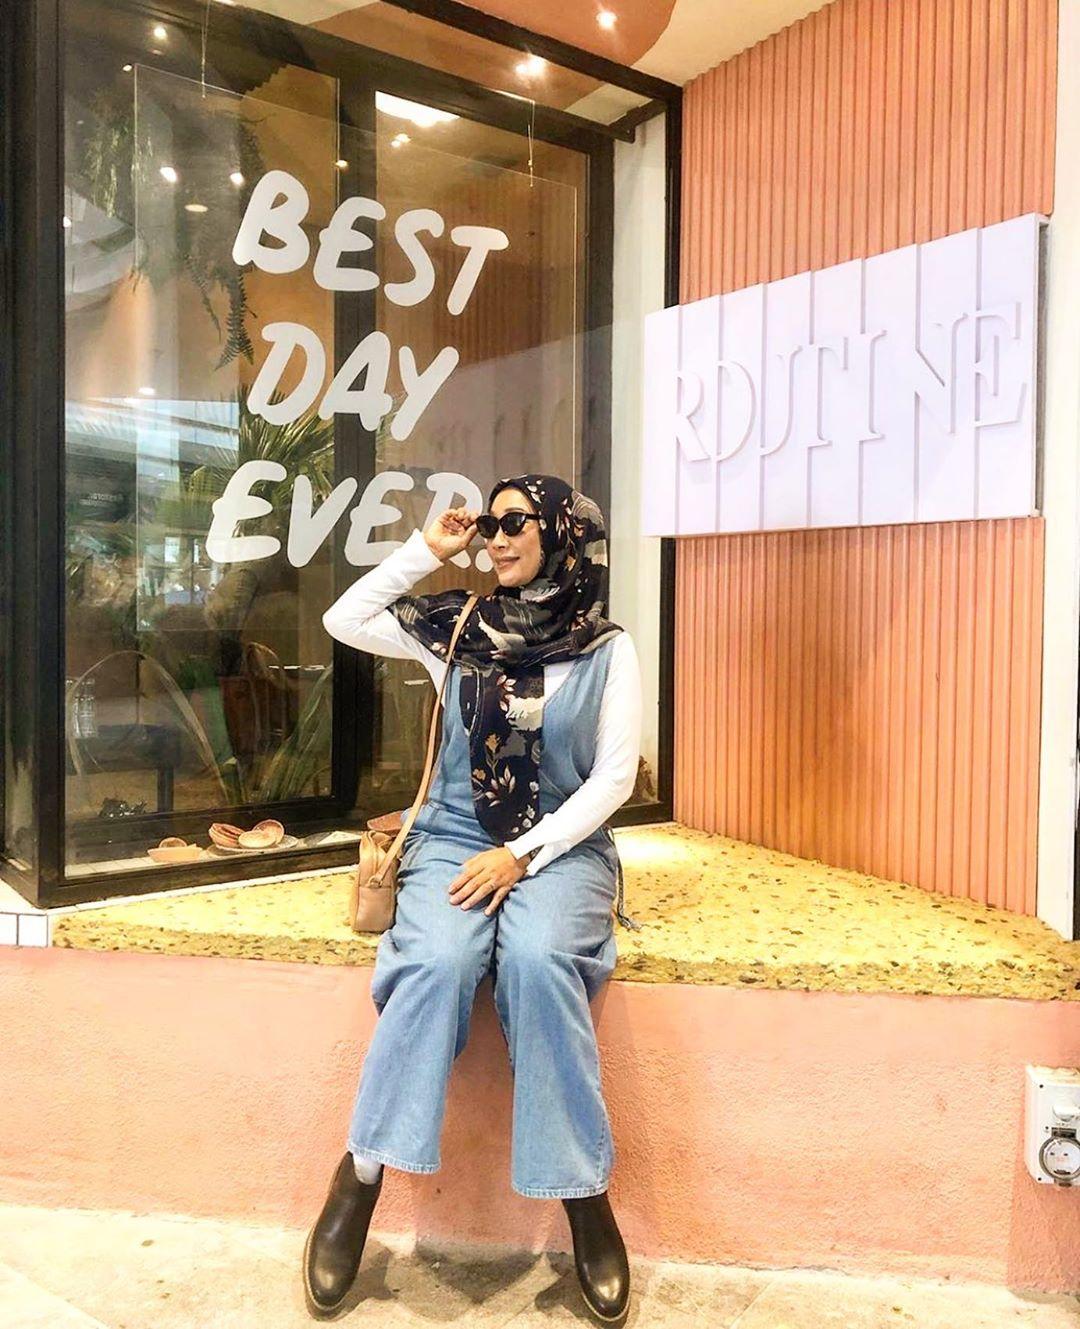 Kafe Muslim-Friendly Di Johor Bahru Ini Cantik & Instagrammable. Perfect For Brunch! Seismik Makan